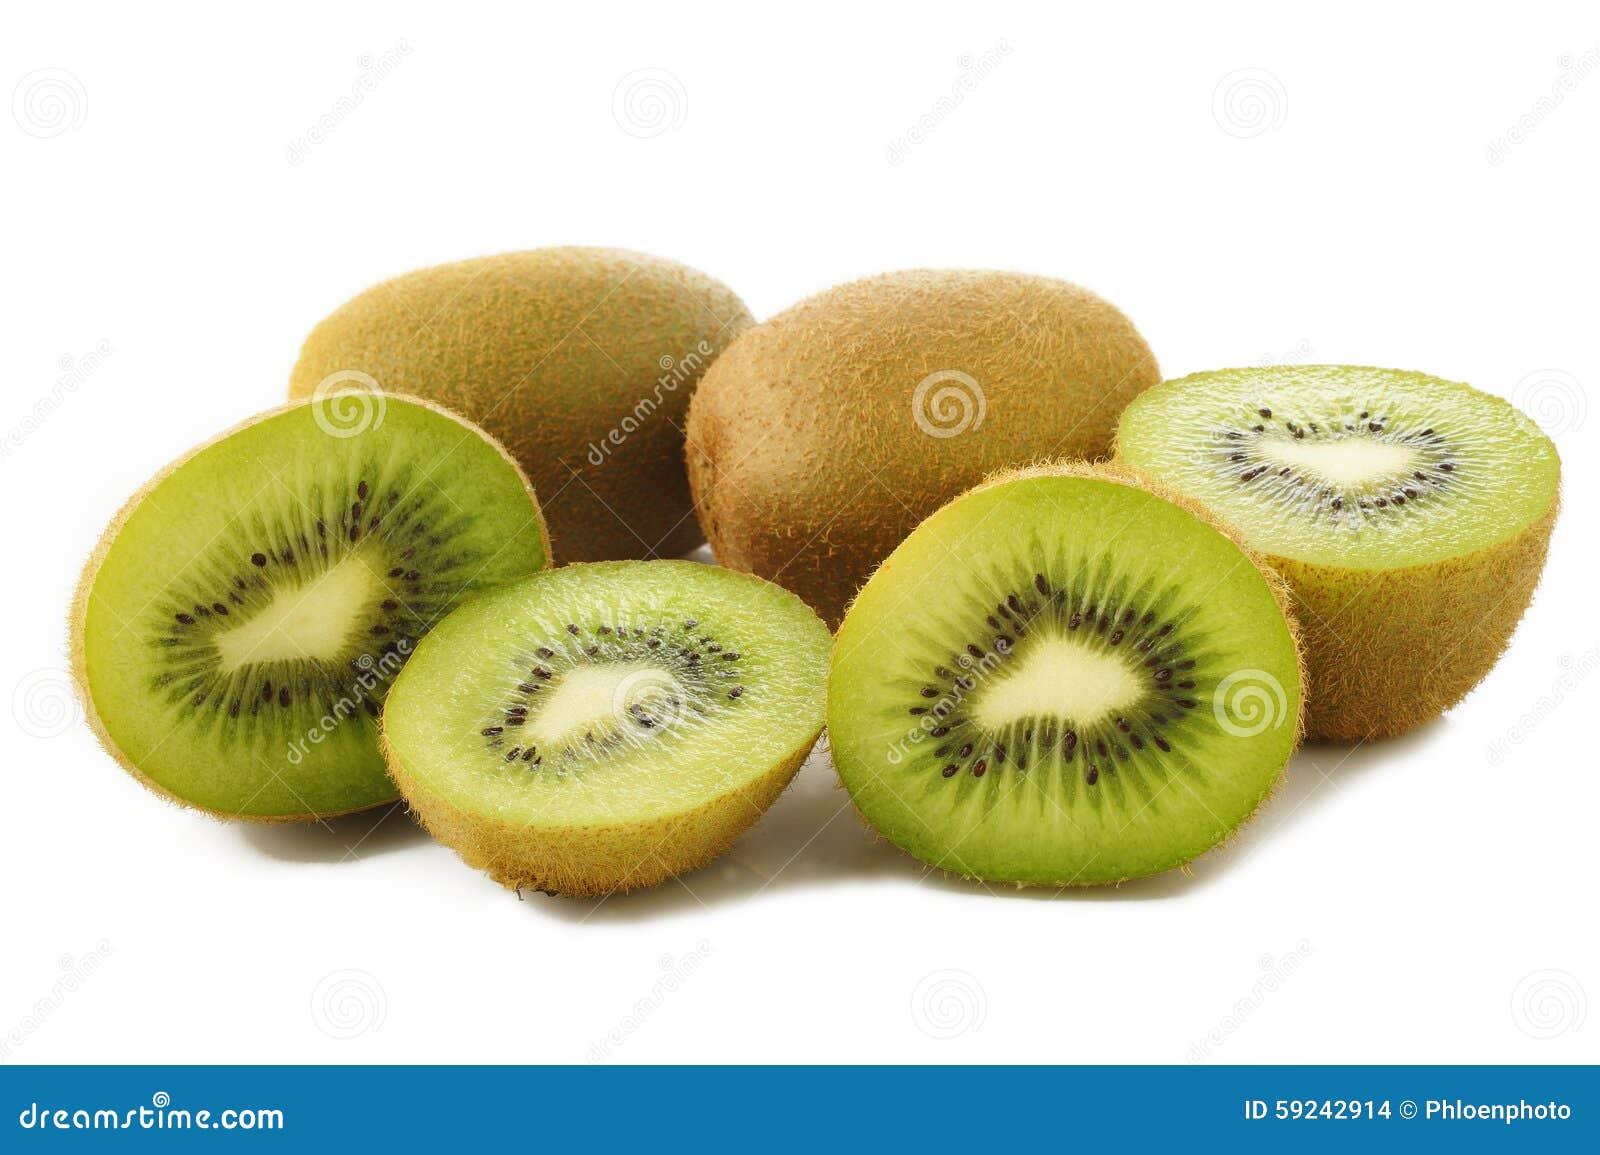 Download Fruta de kiwi foto de archivo. Imagen de vegetariano - 59242914